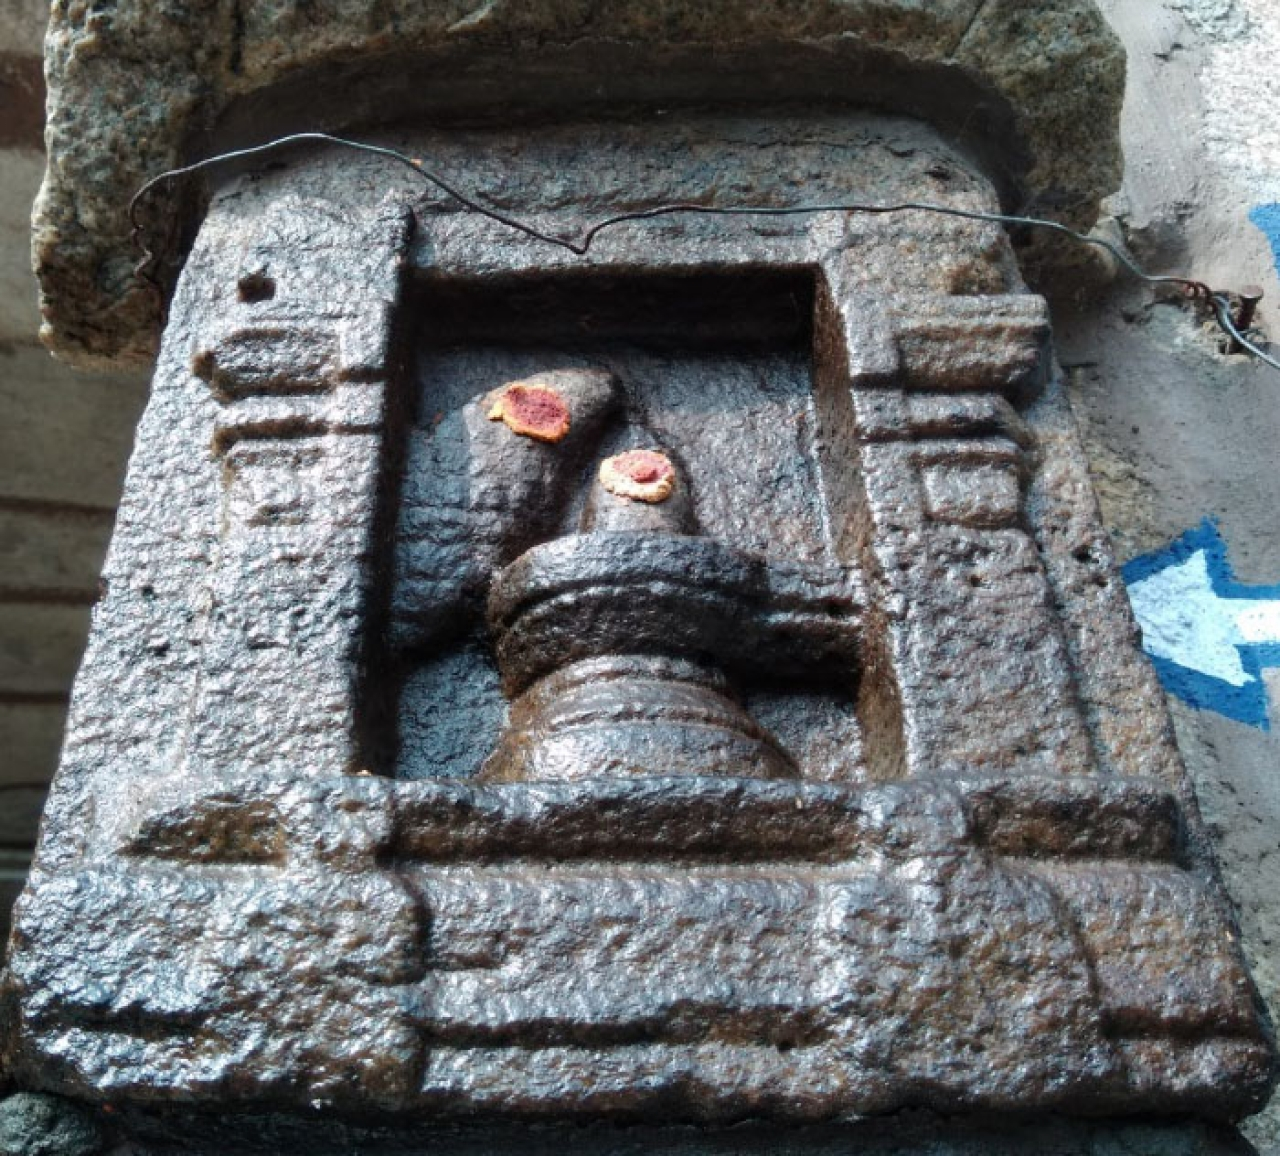 Vishnu incarnated as a fish worshipping Shiva